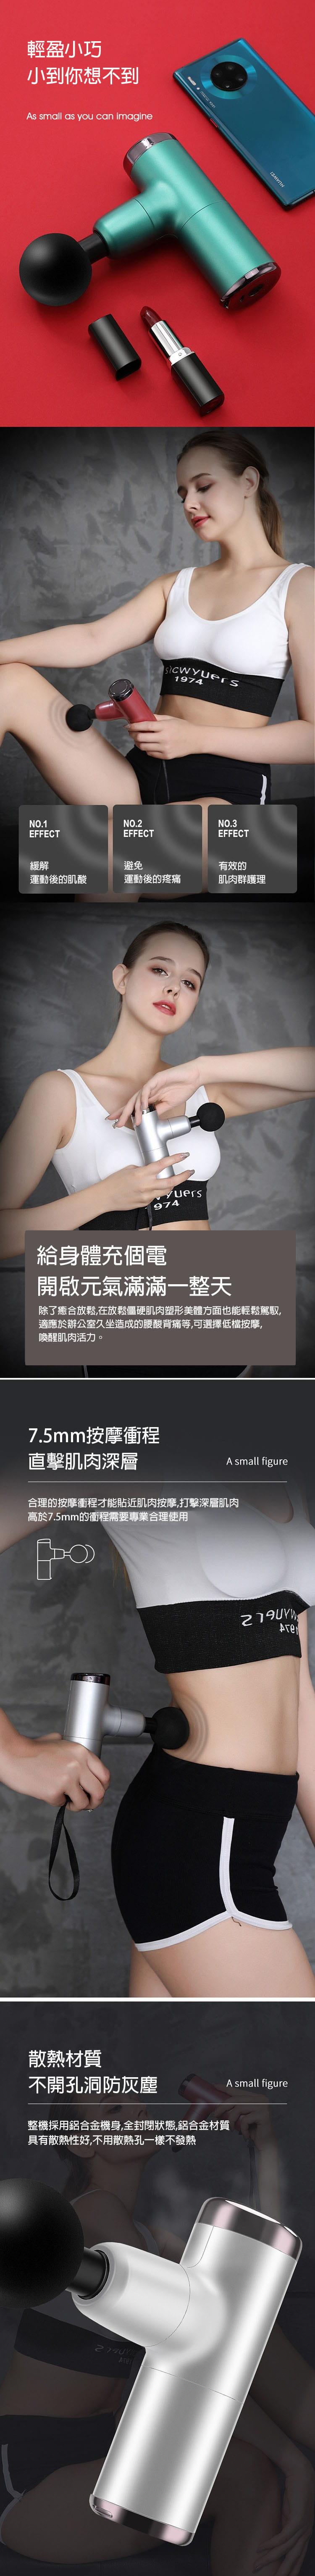 mini 迷你USB電動按摩槍多功能健身肌肉按摩槍mini口袋筋膜槍 2